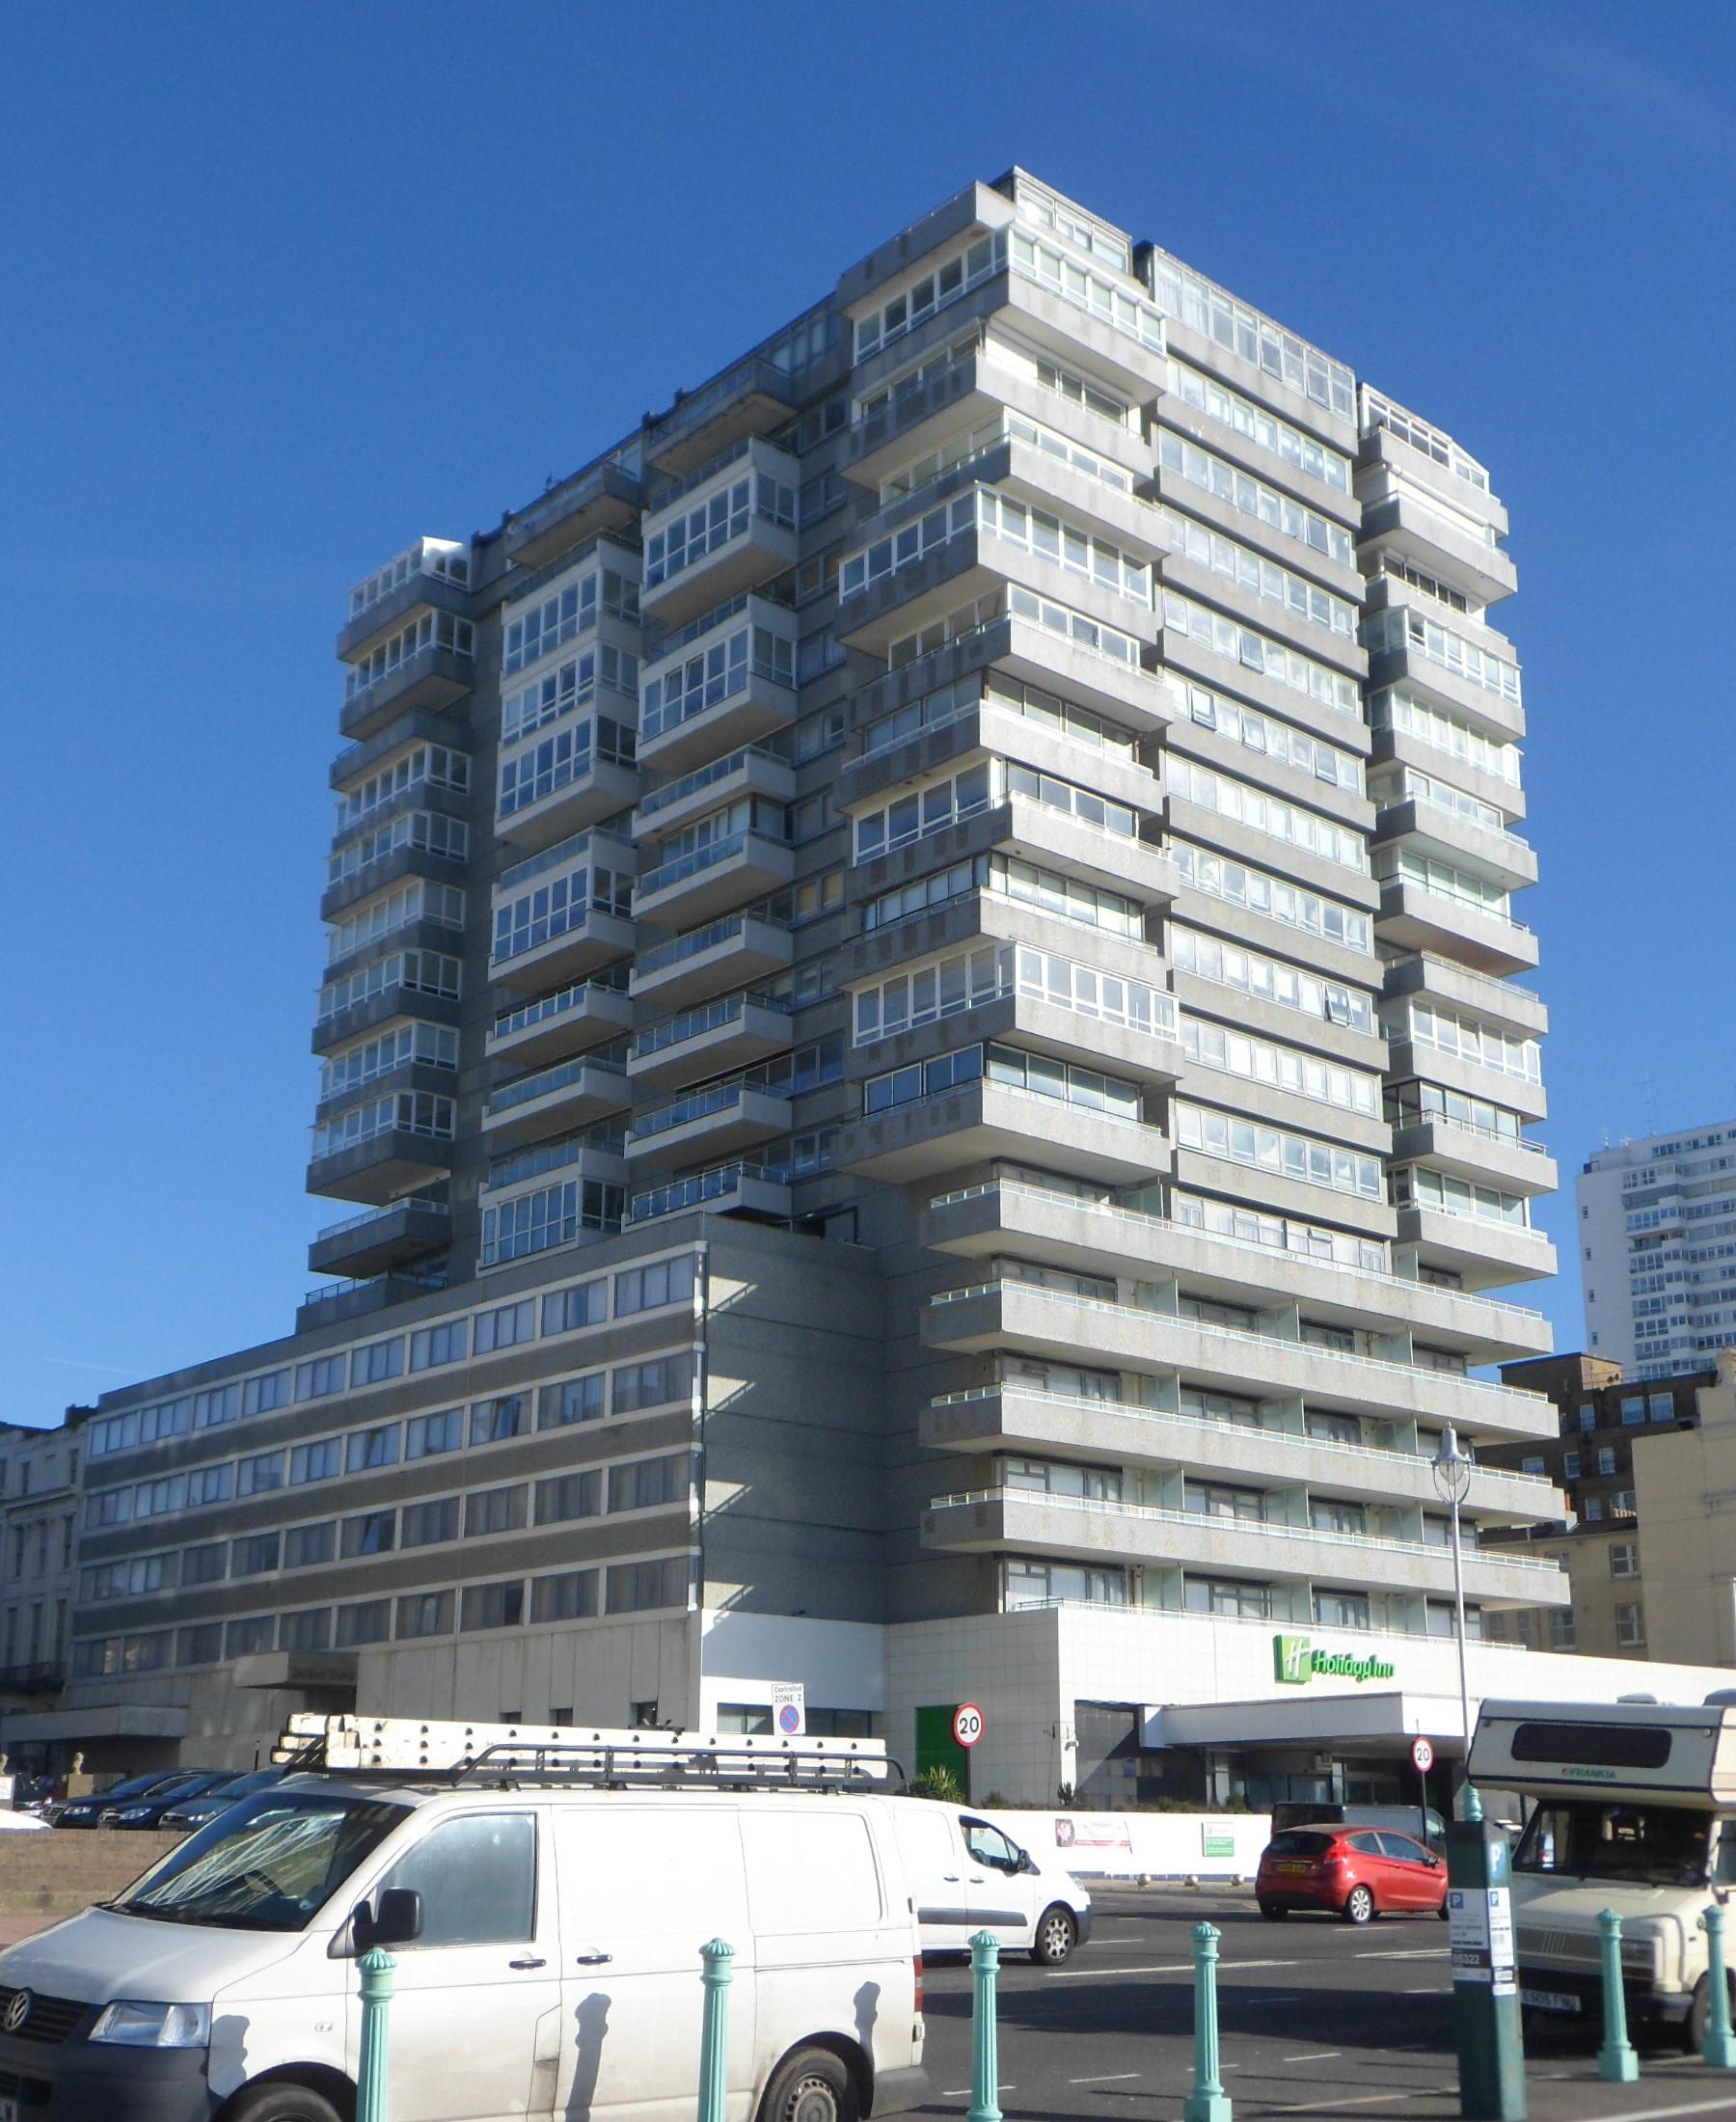 City Inn Hotel Antwerpen